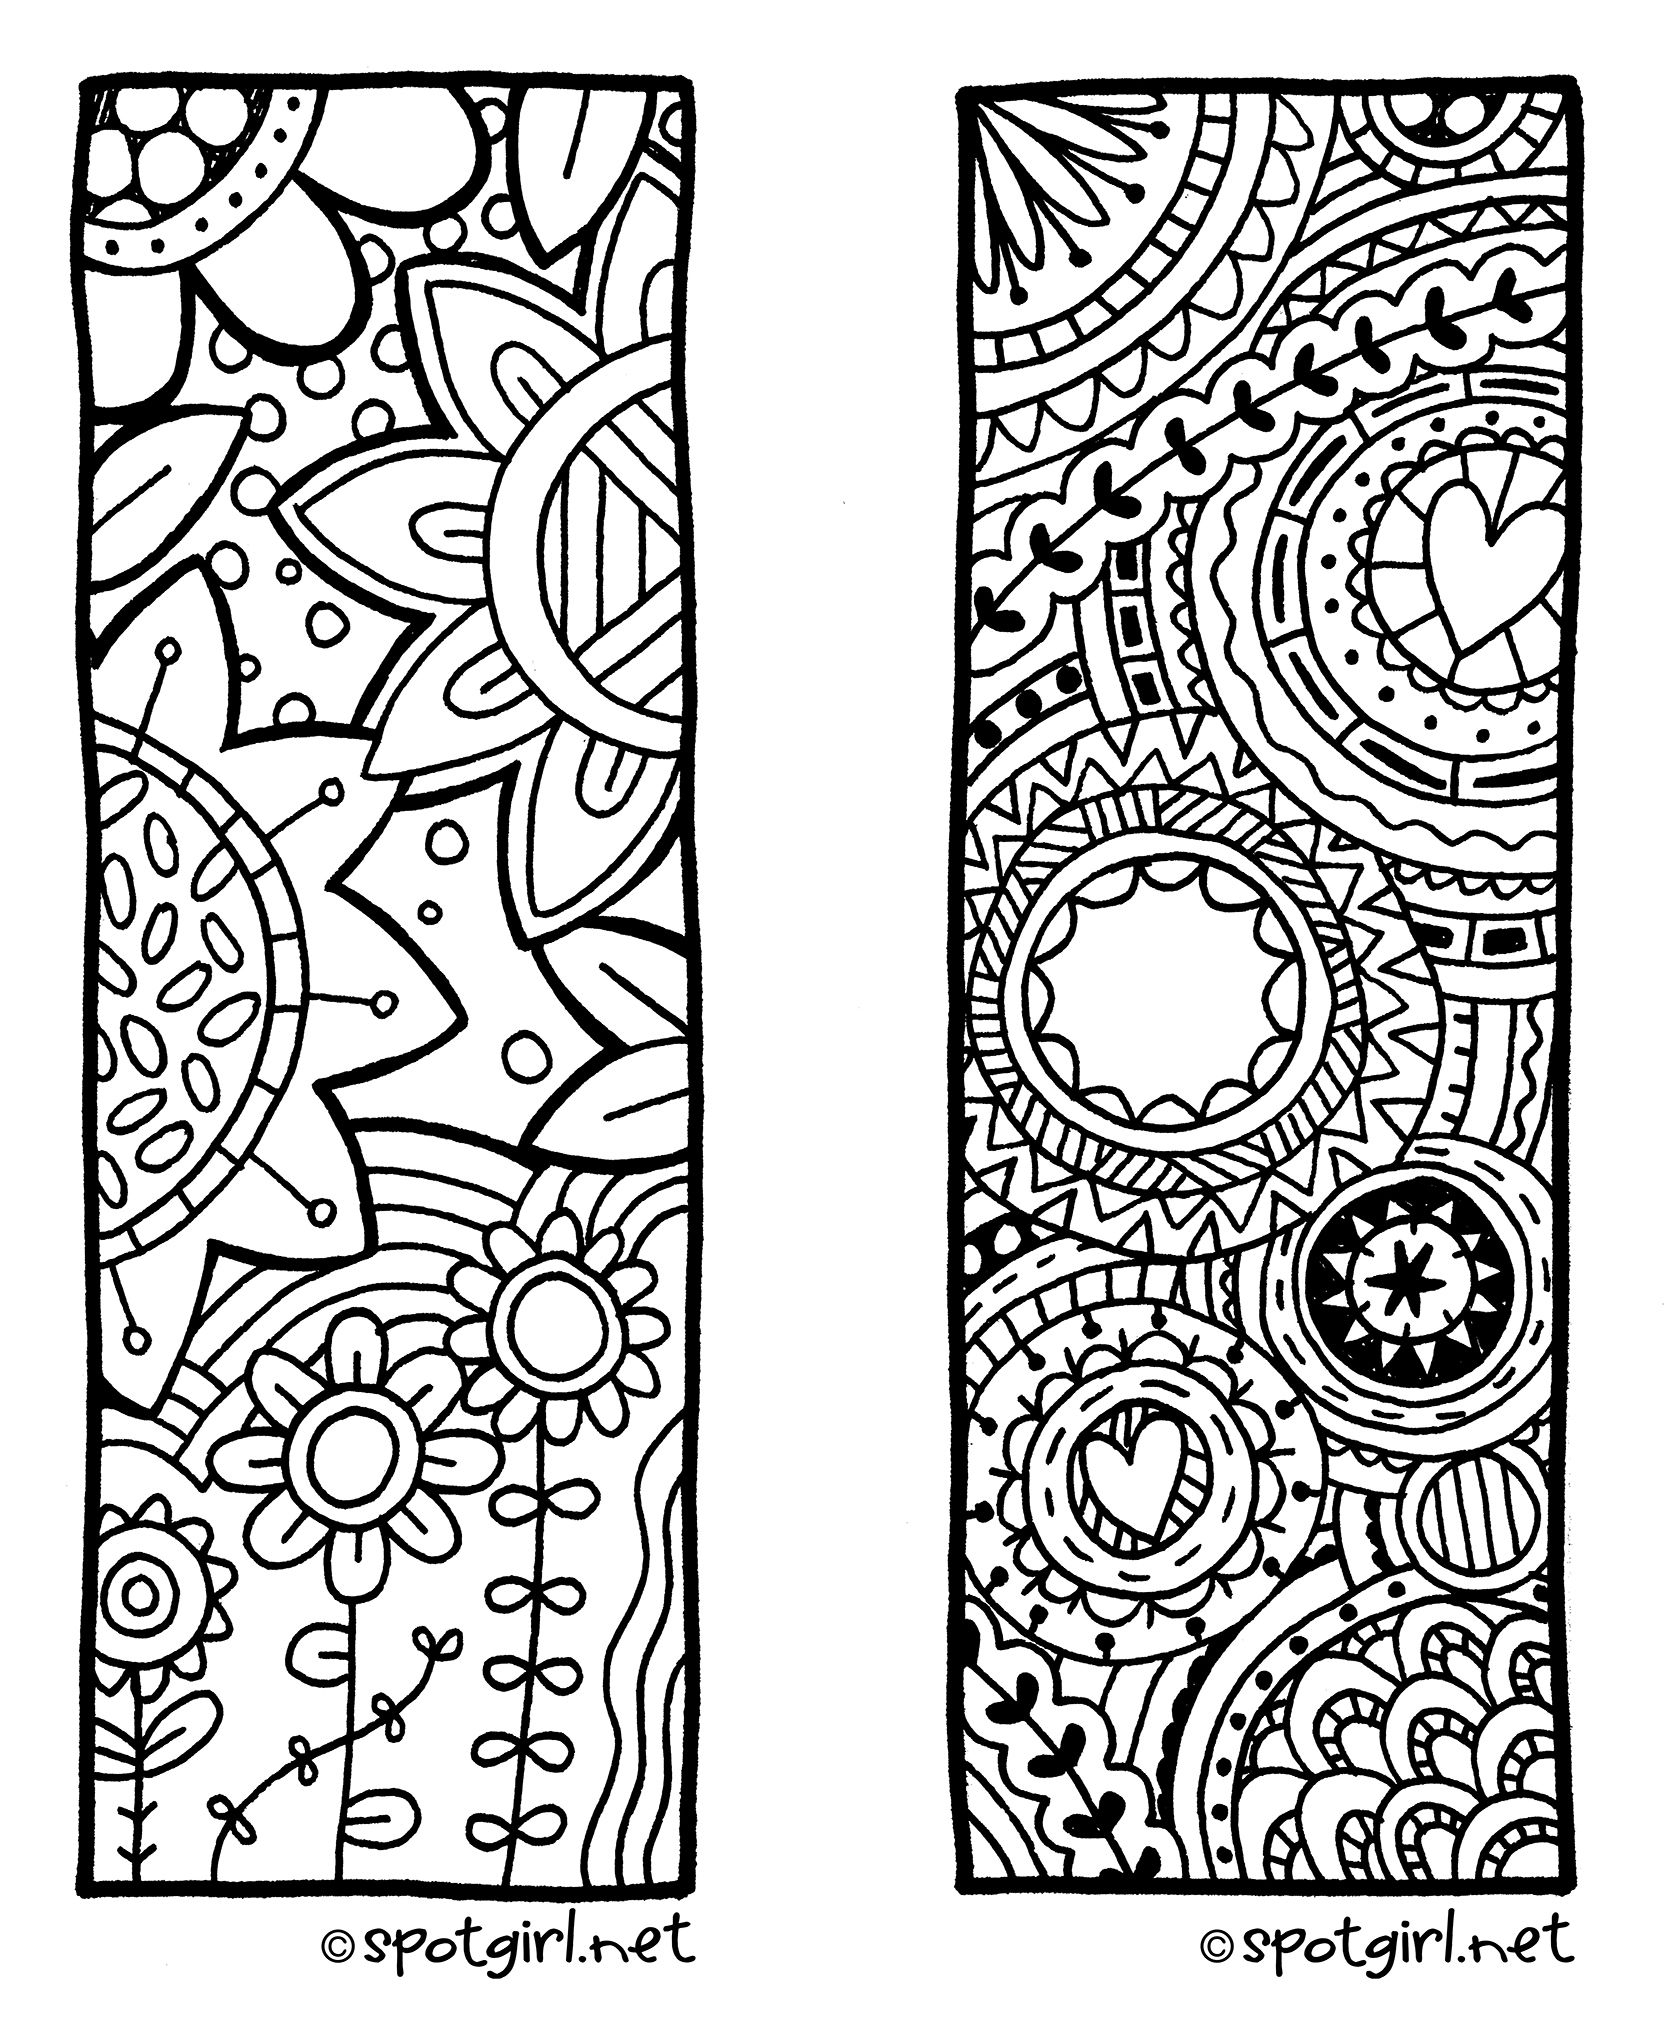 Zentangle Bookmark Printable From Spotgirl-Hotcakes.blogspot - Free Printable Zentangle Templates